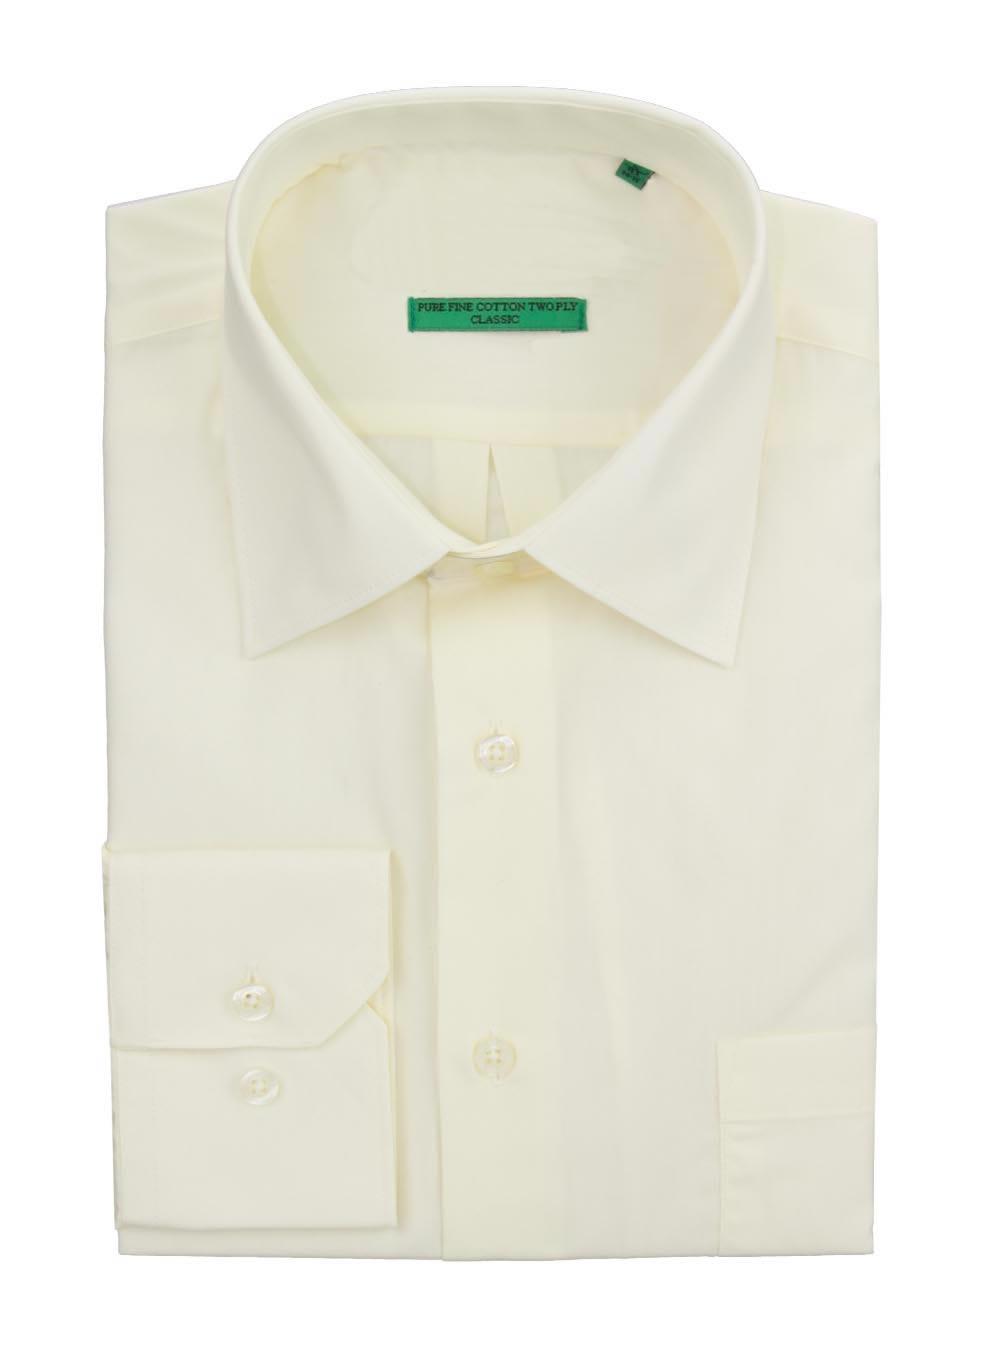 DTI BB Signature Men's Modern Classic Fit 2 Ply Pure Cotton Solid Dress Shirt Vanilla Ice